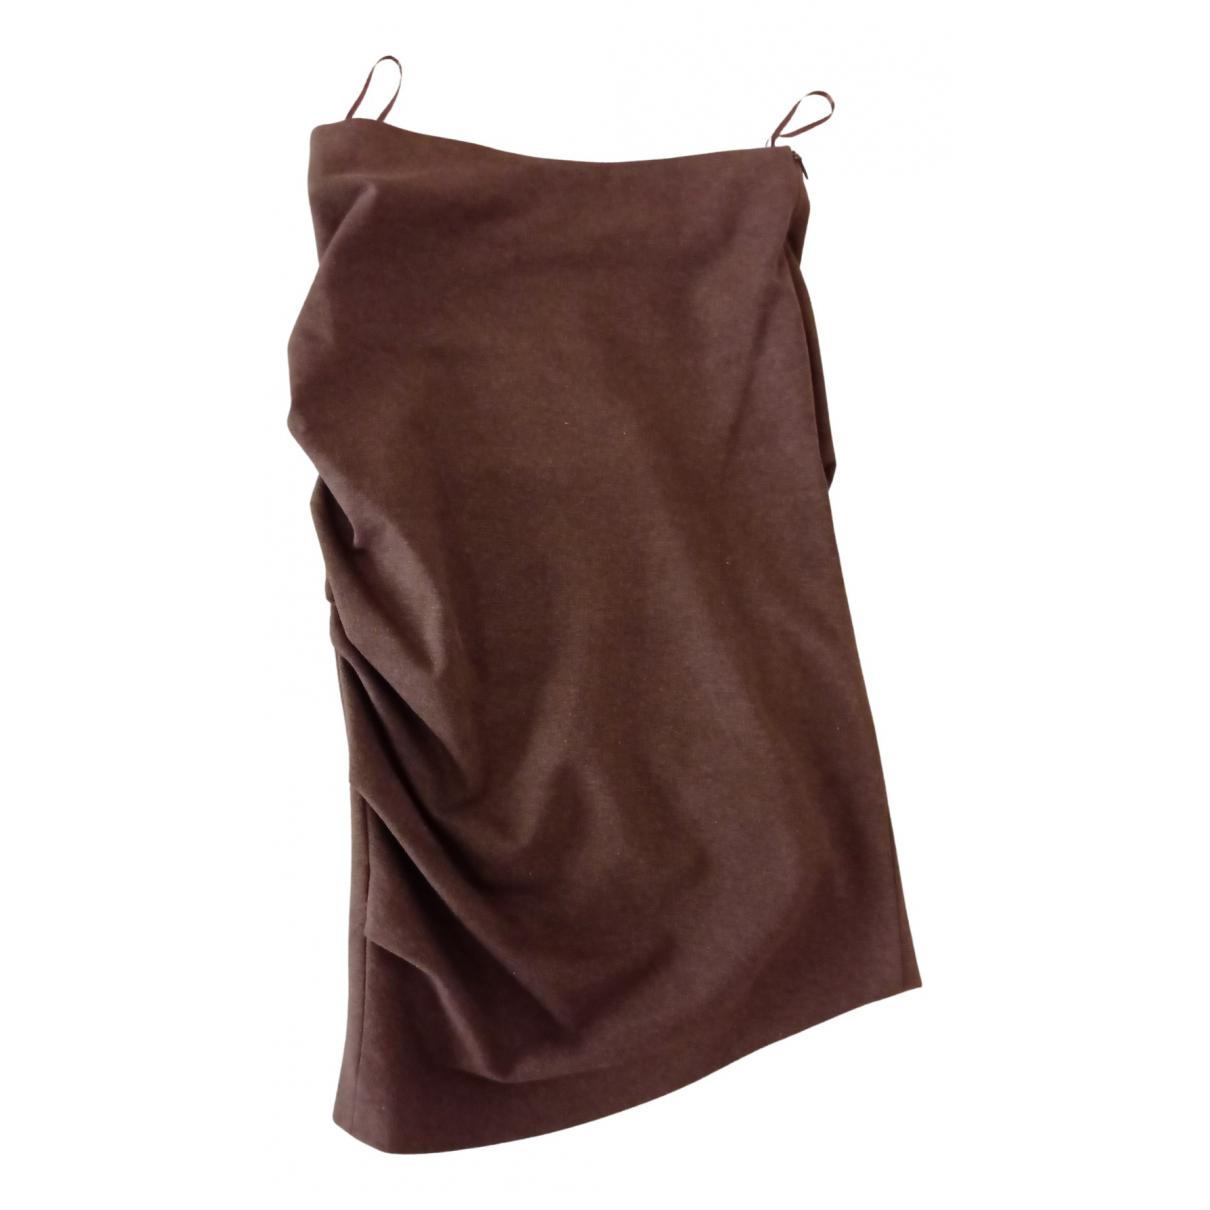 Brunello Cucinelli N Brown Cotton skirt for Women 38 IT